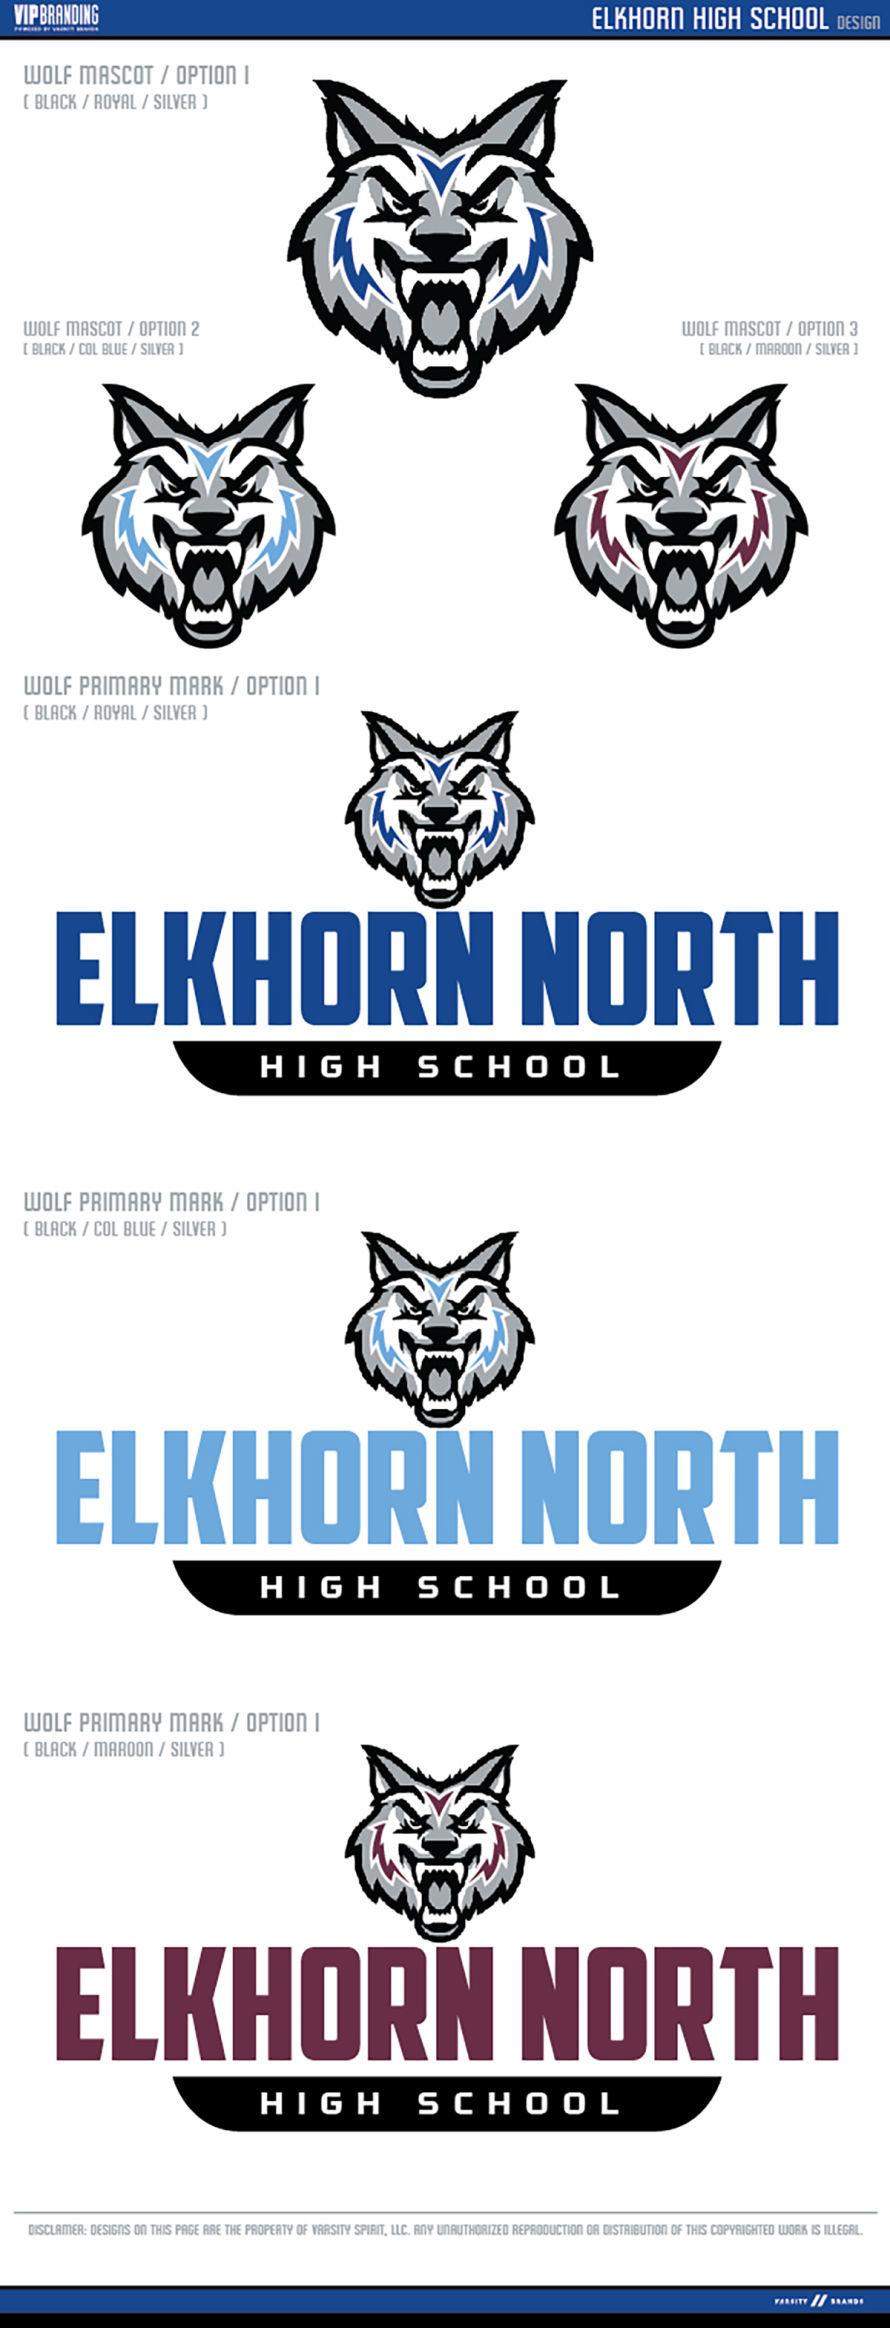 ENHS_Wolves